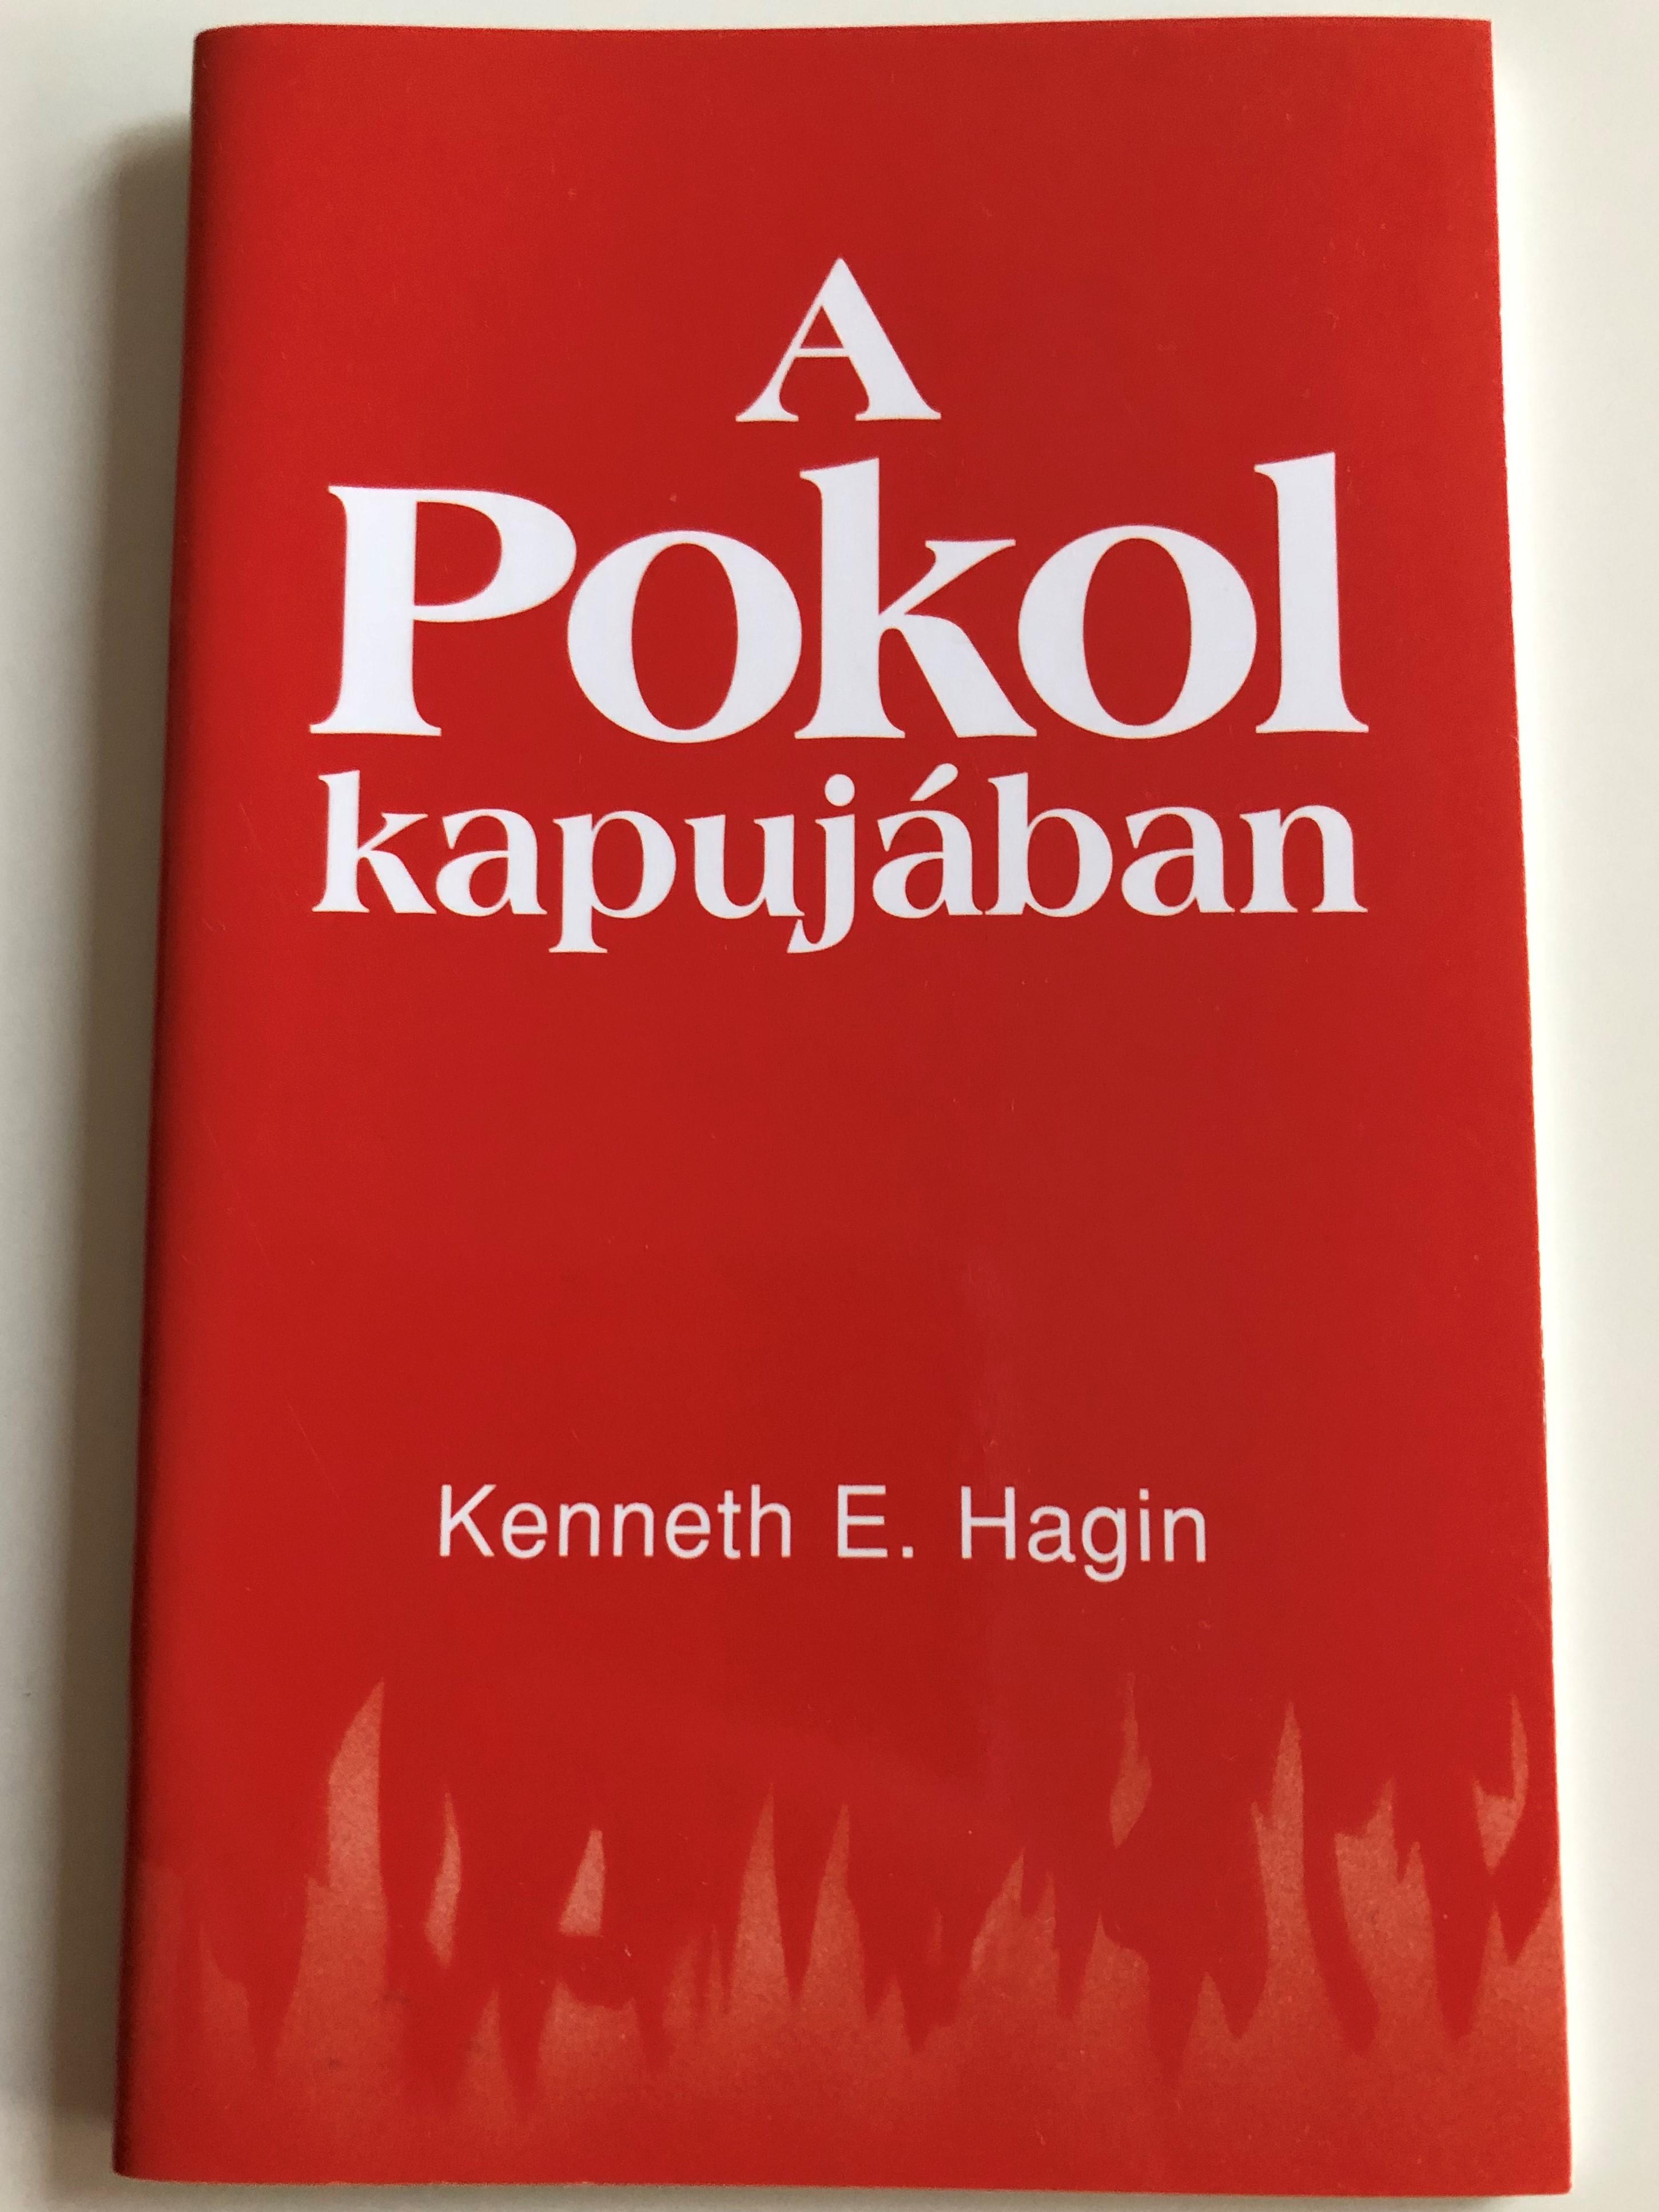 a-pokol-kapuj-ban-by-kenneth-e.-hagin-hungarian-edition-of-hell-1-.jpg